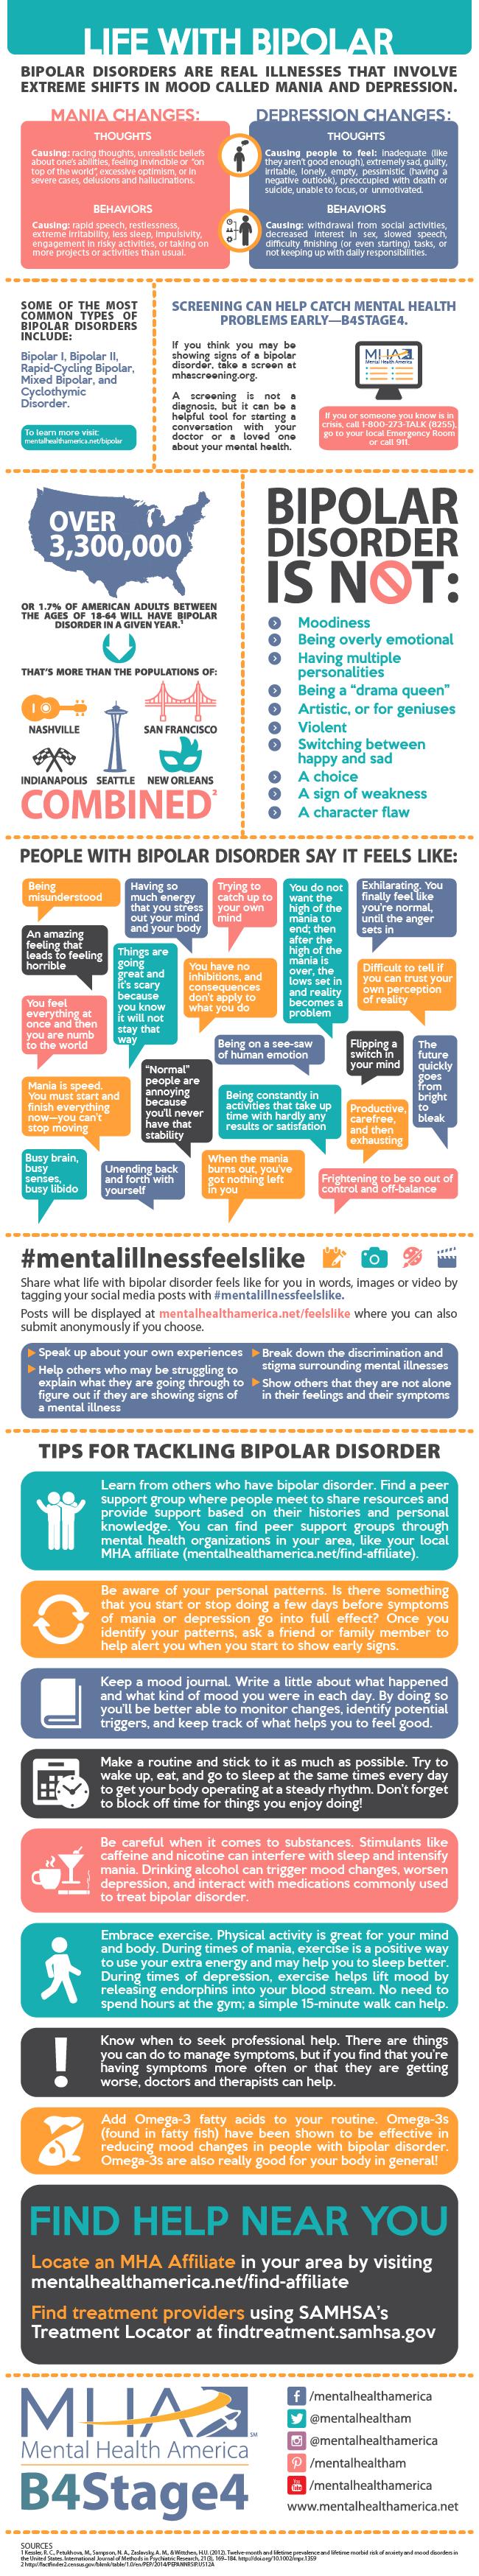 Life with Bipolar